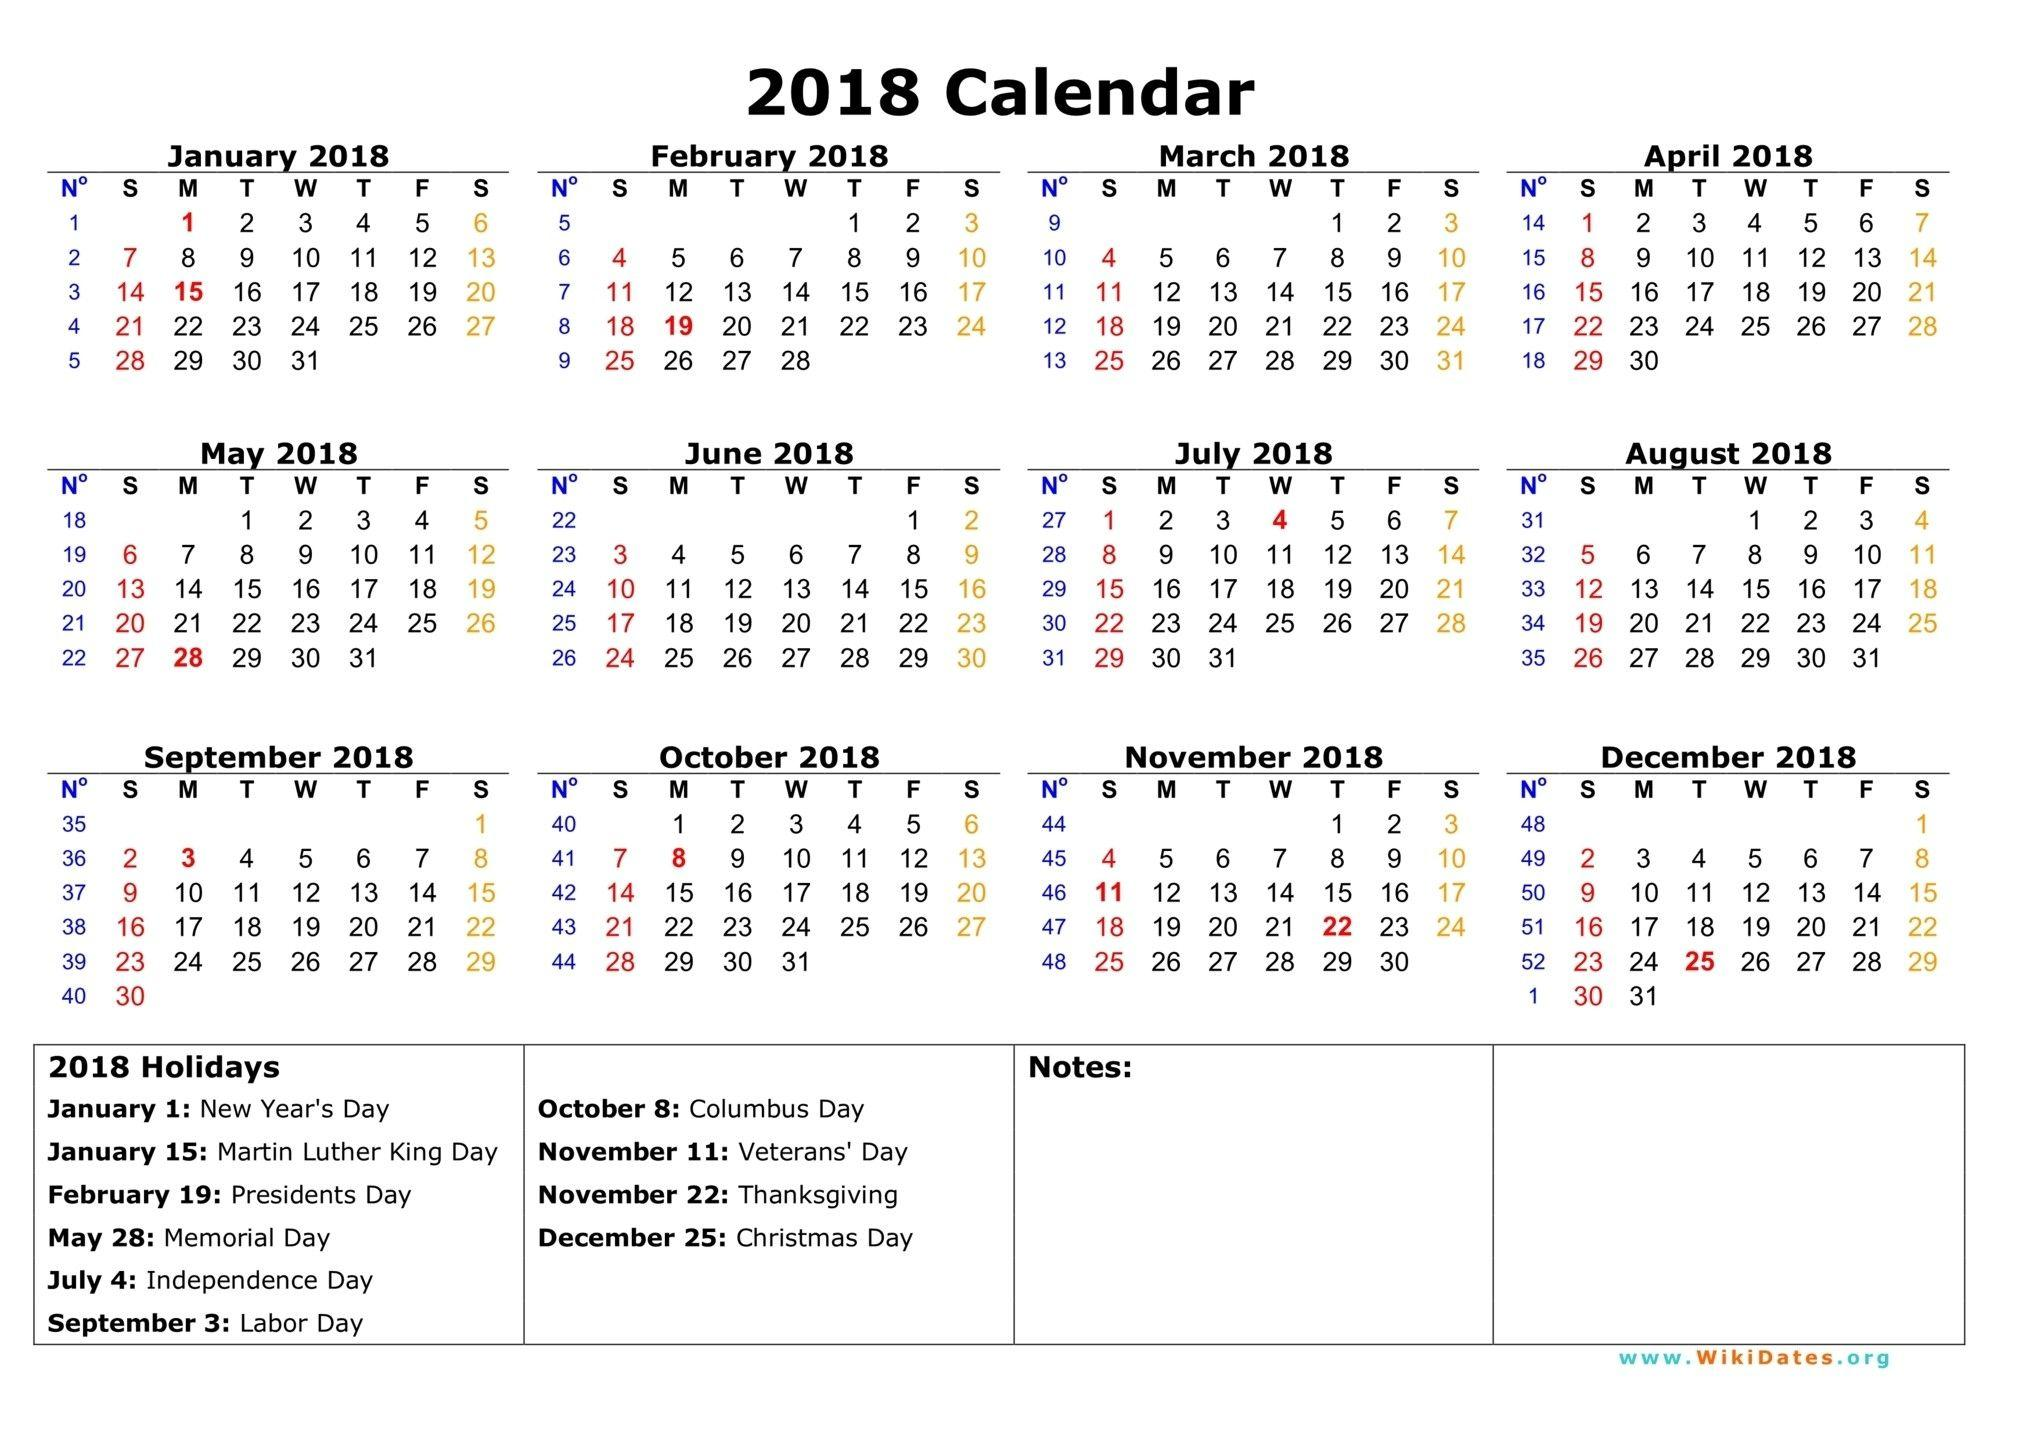 wallpaper calendars for 2018 61 images